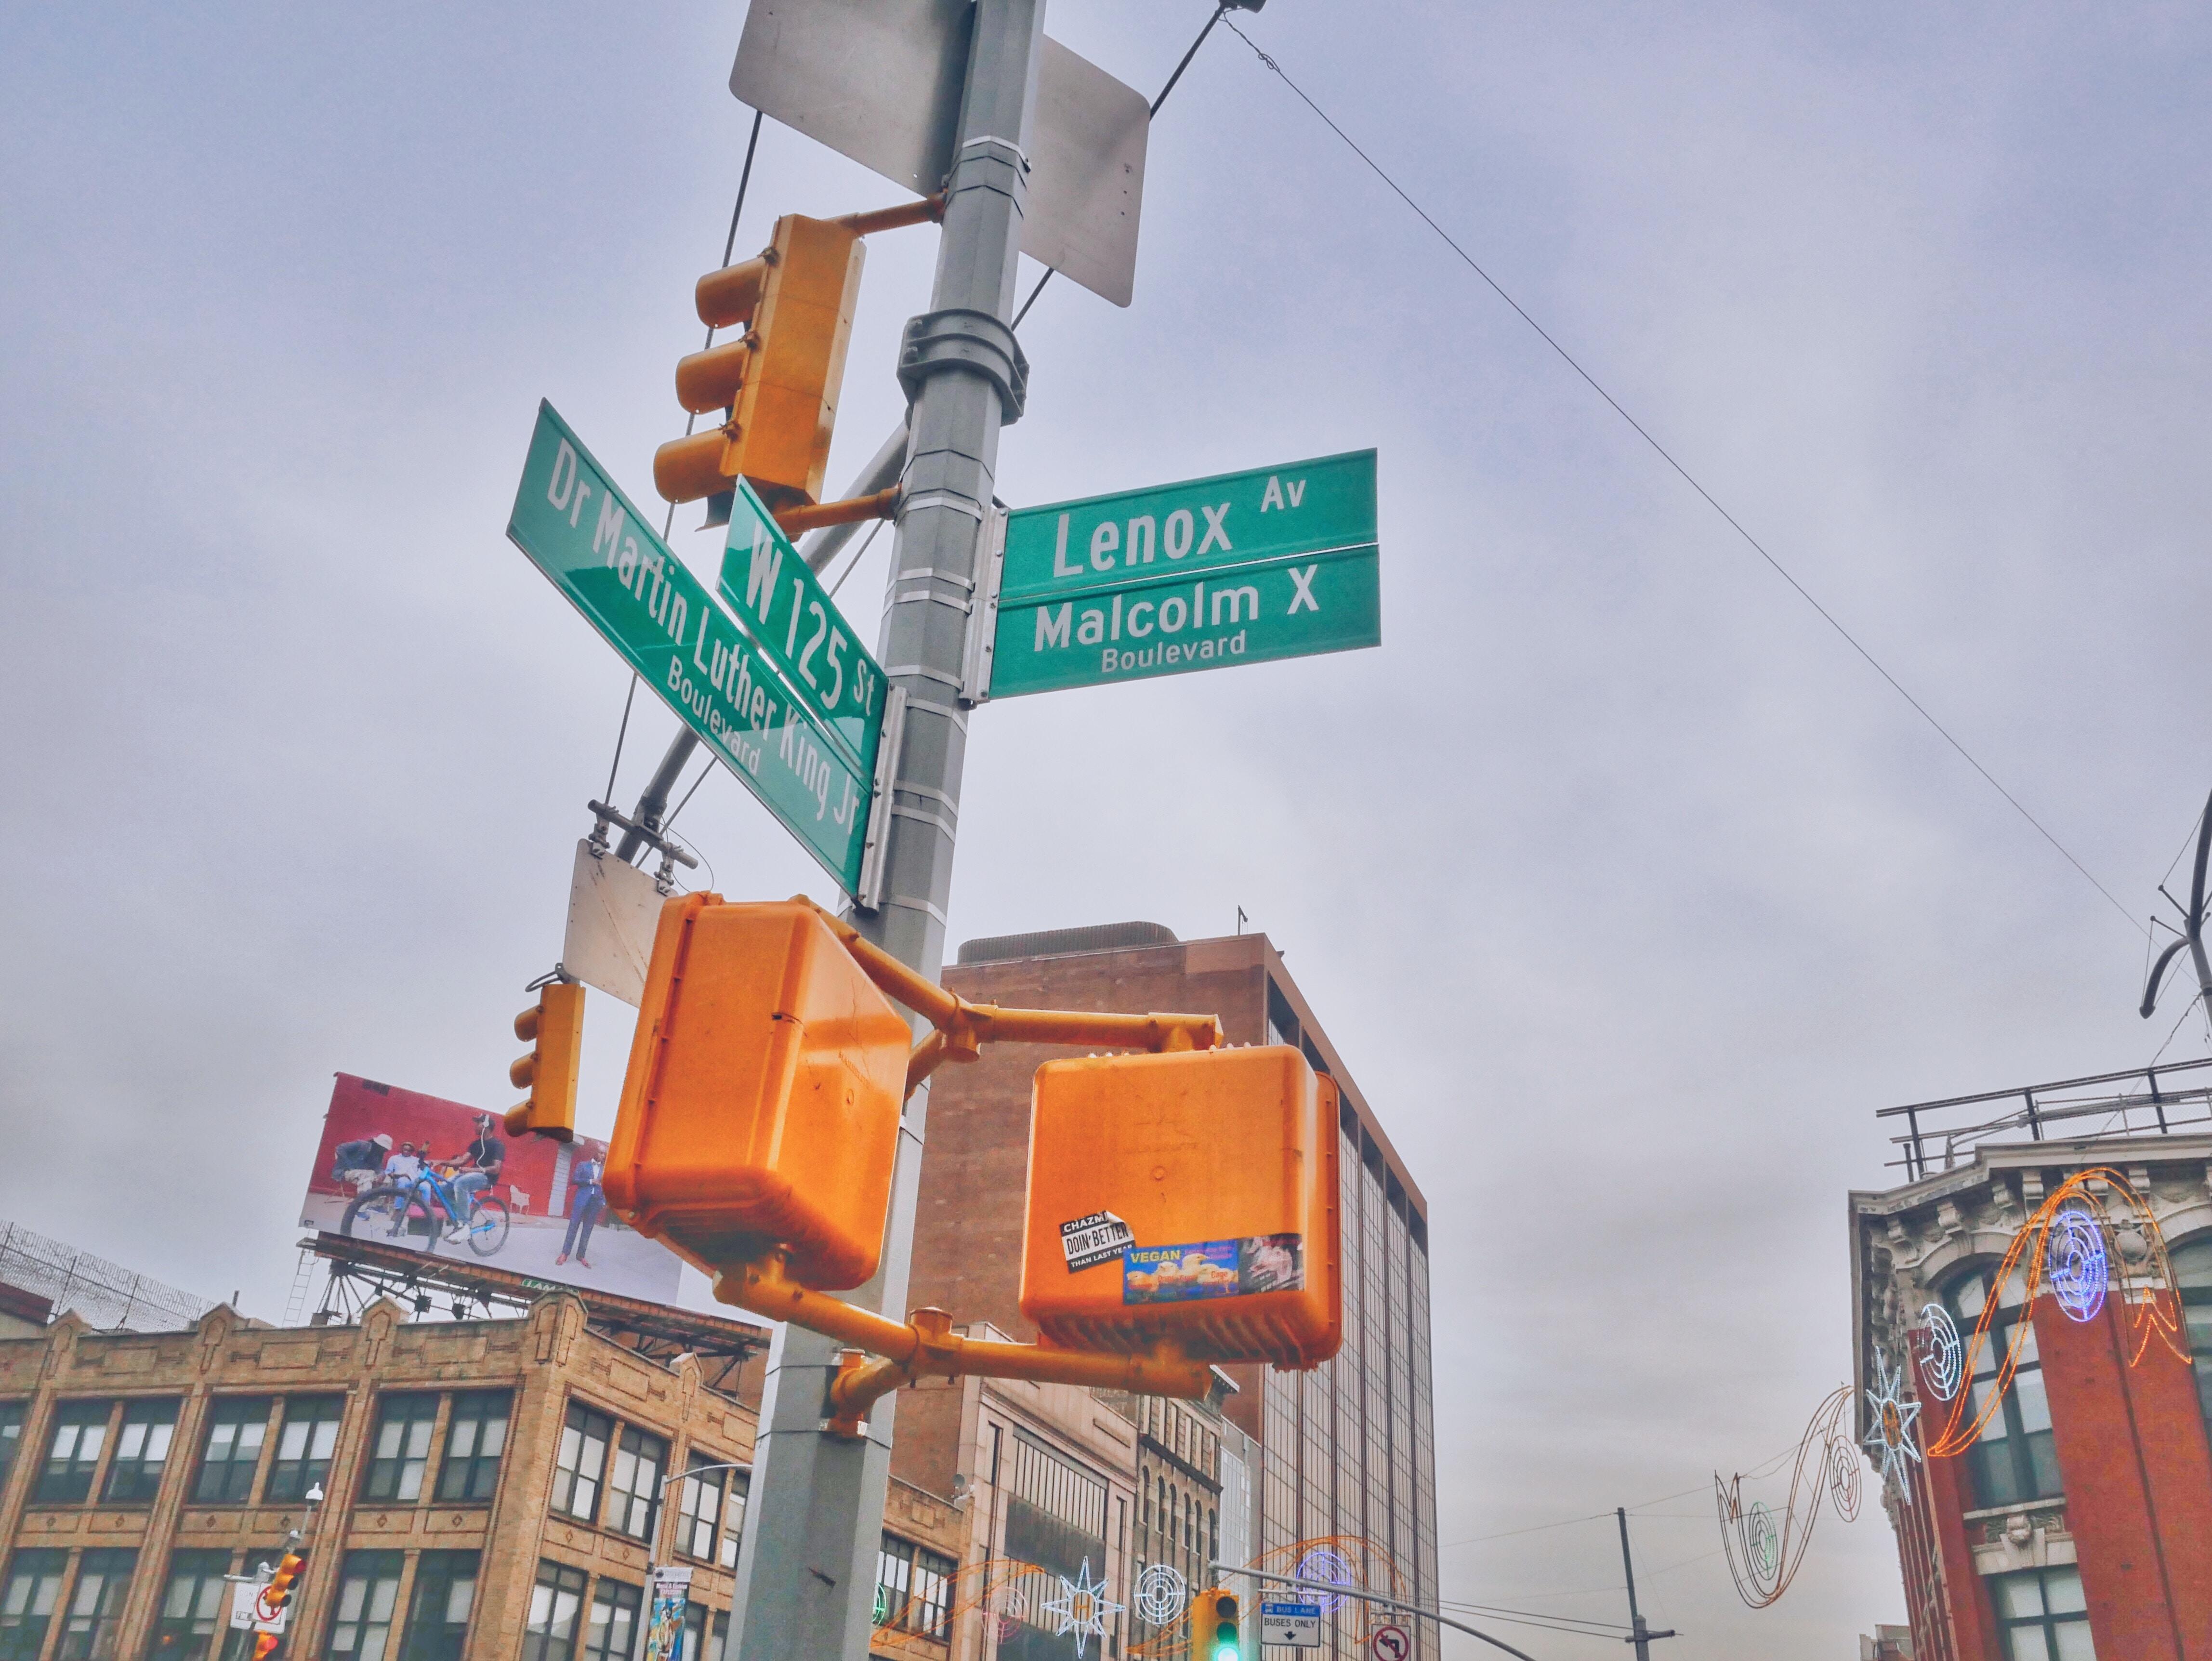 photography of street signage